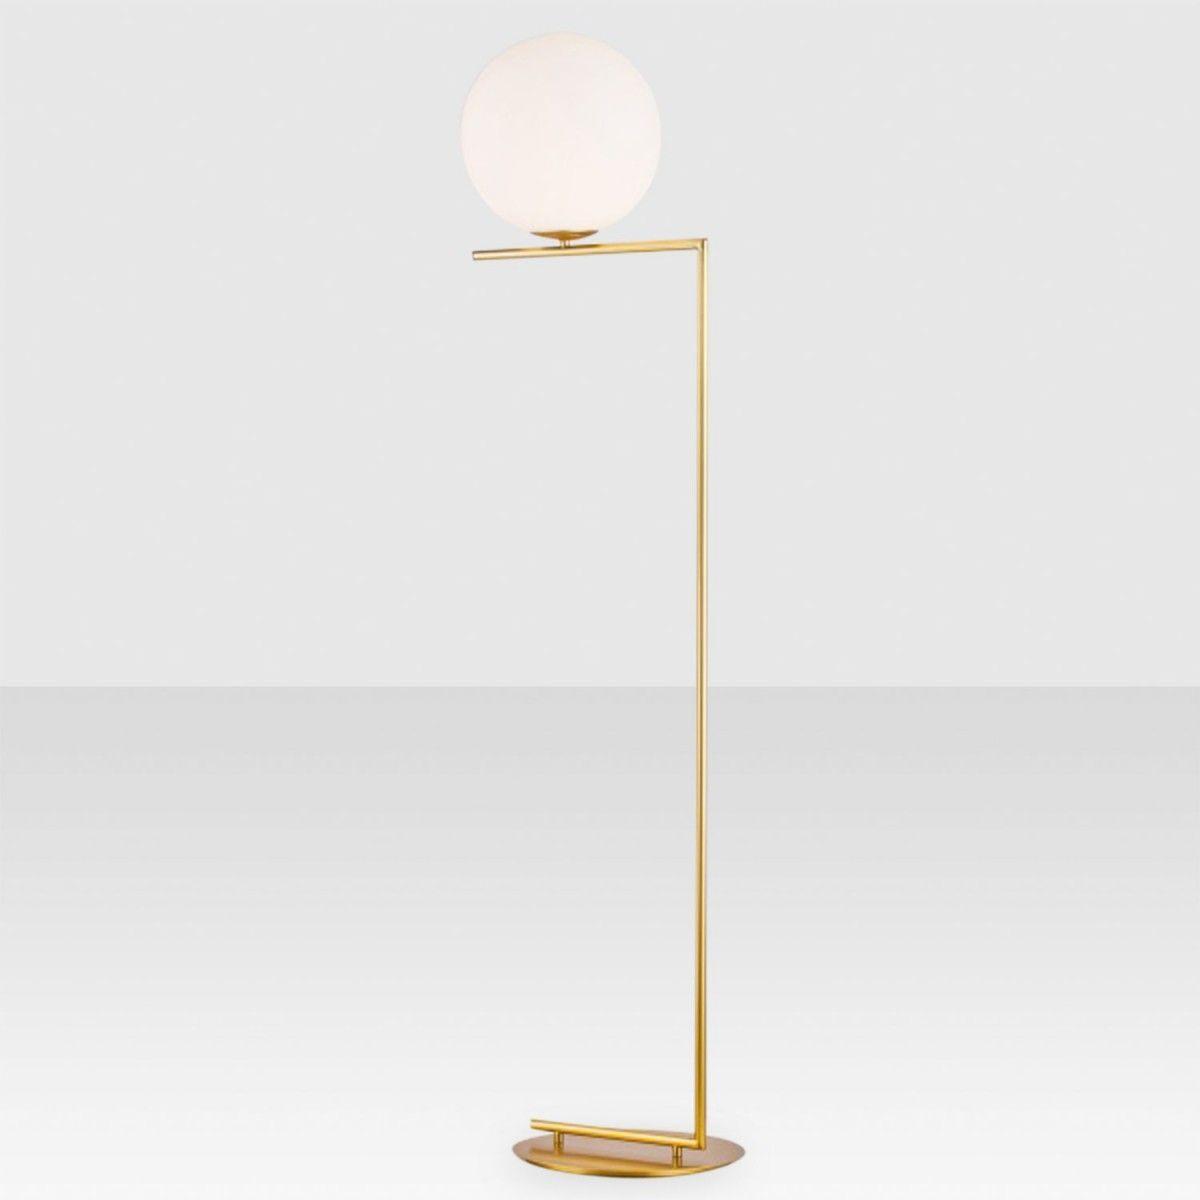 Offset globe floor lamp brass elte market 379cad lighting offset globe floor lamp brass elte market 379cad aloadofball Choice Image